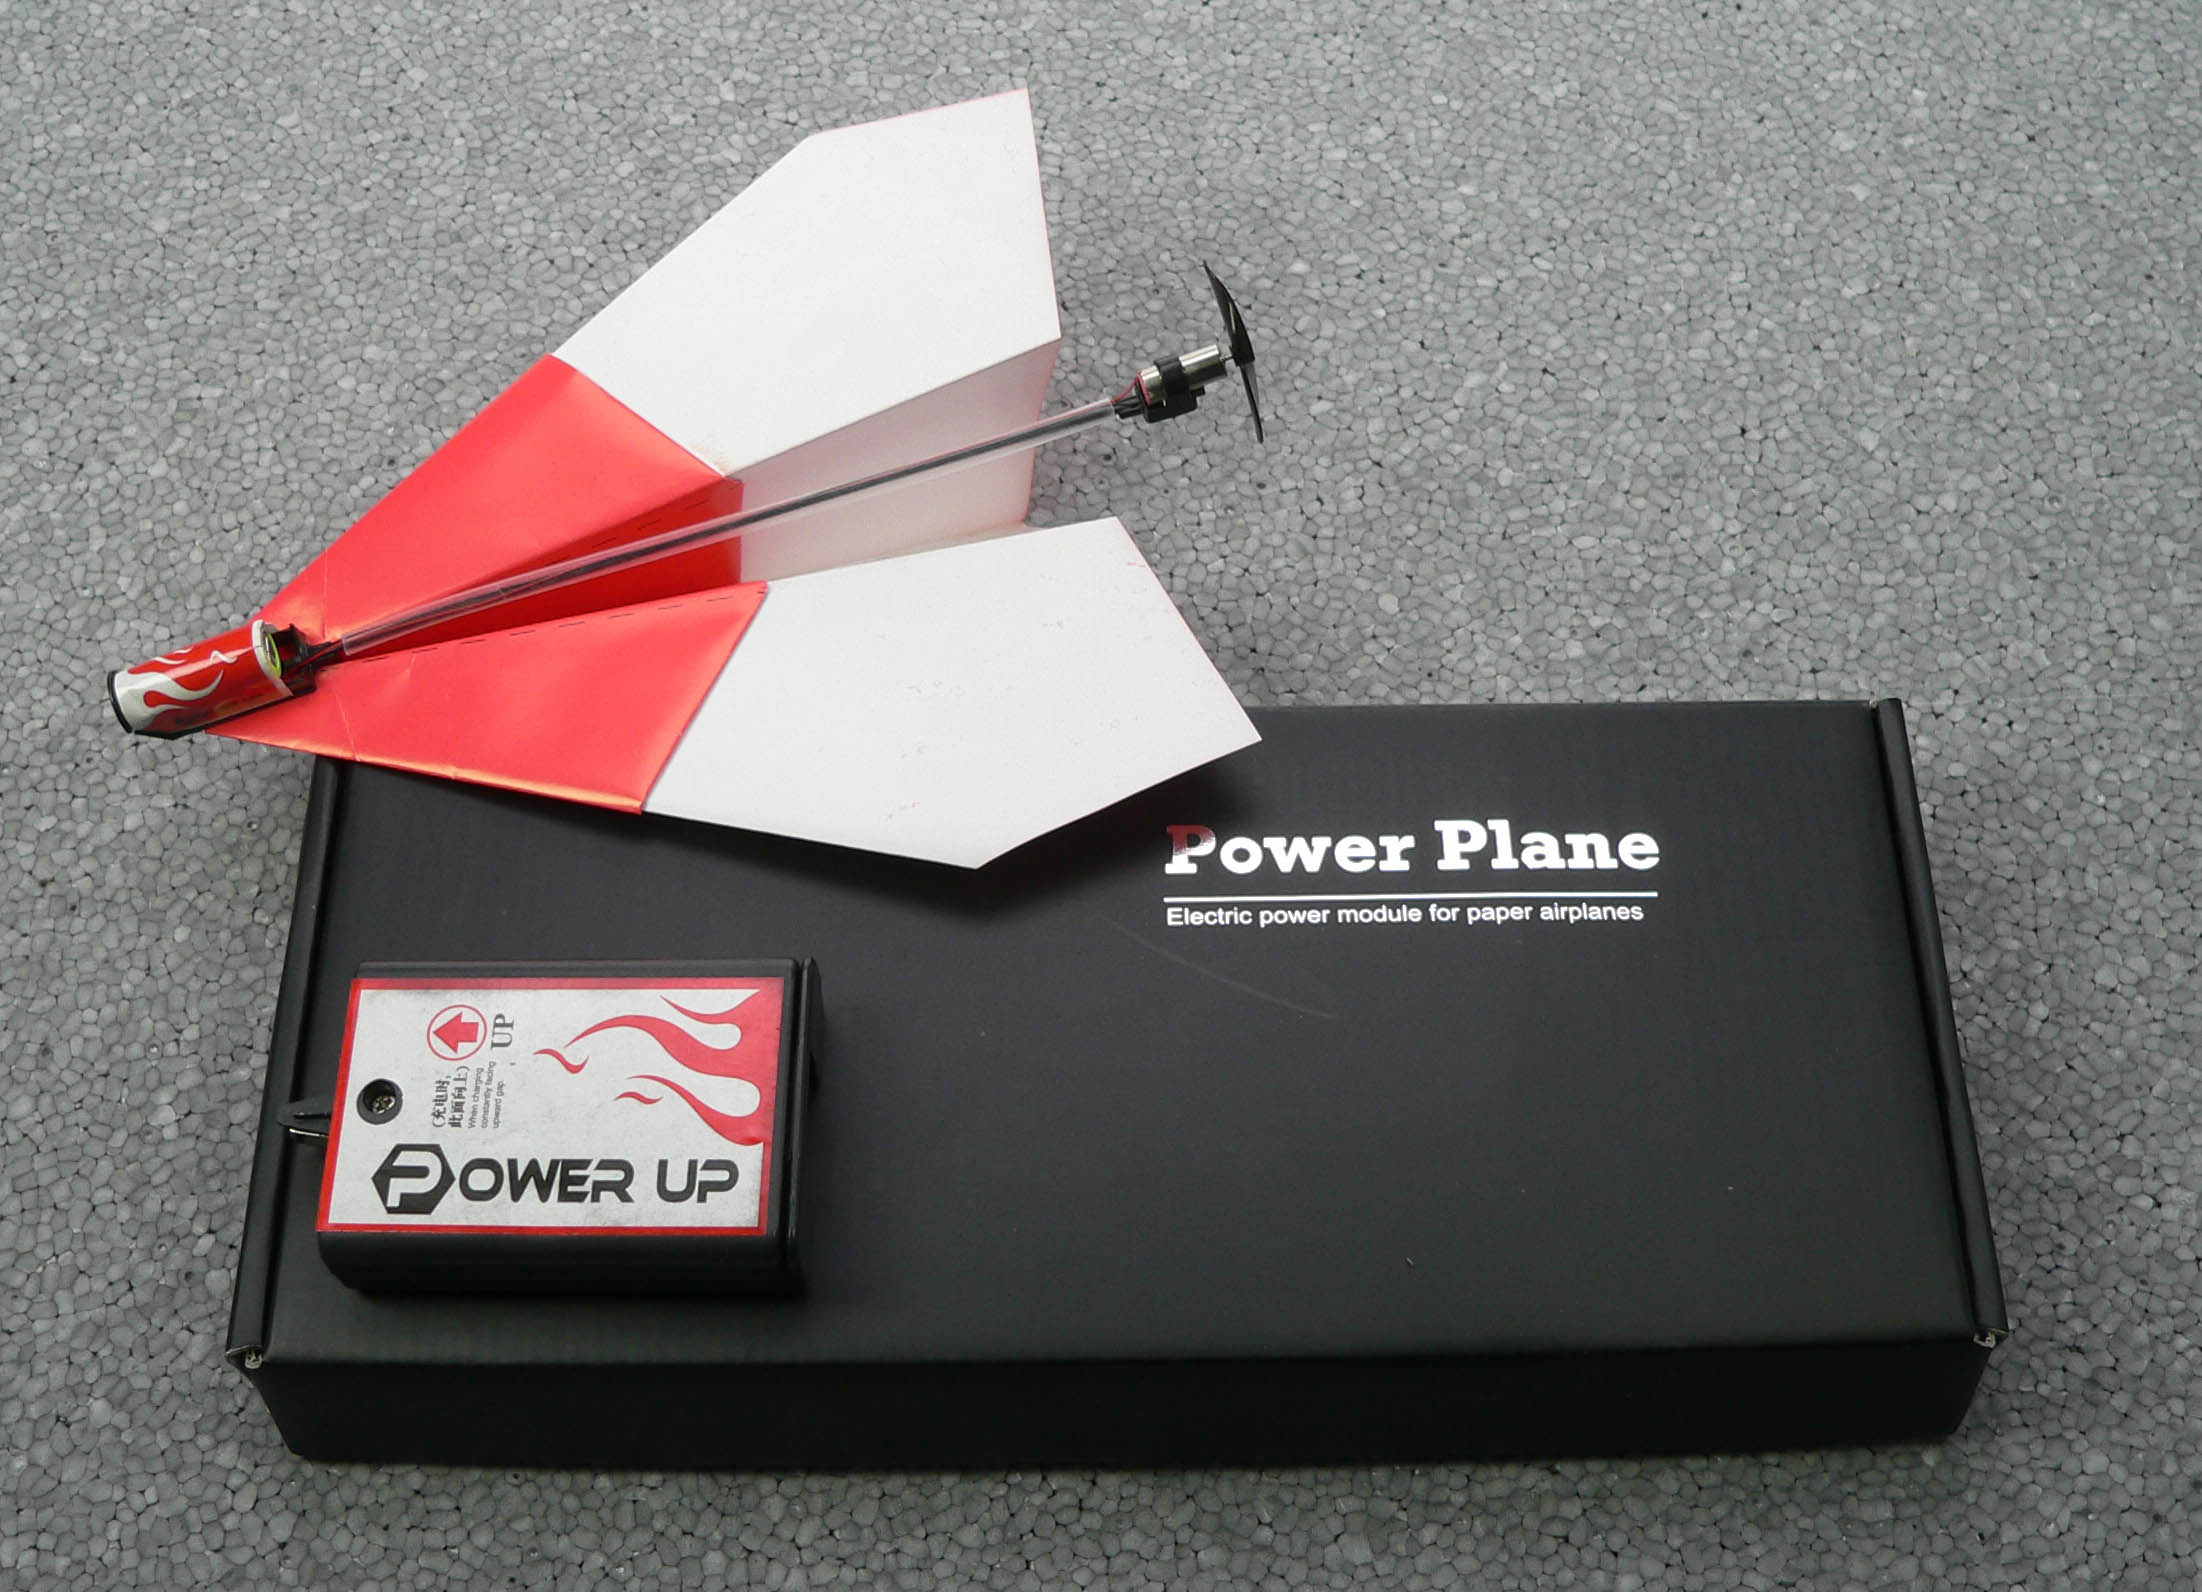 papierflieger spiel